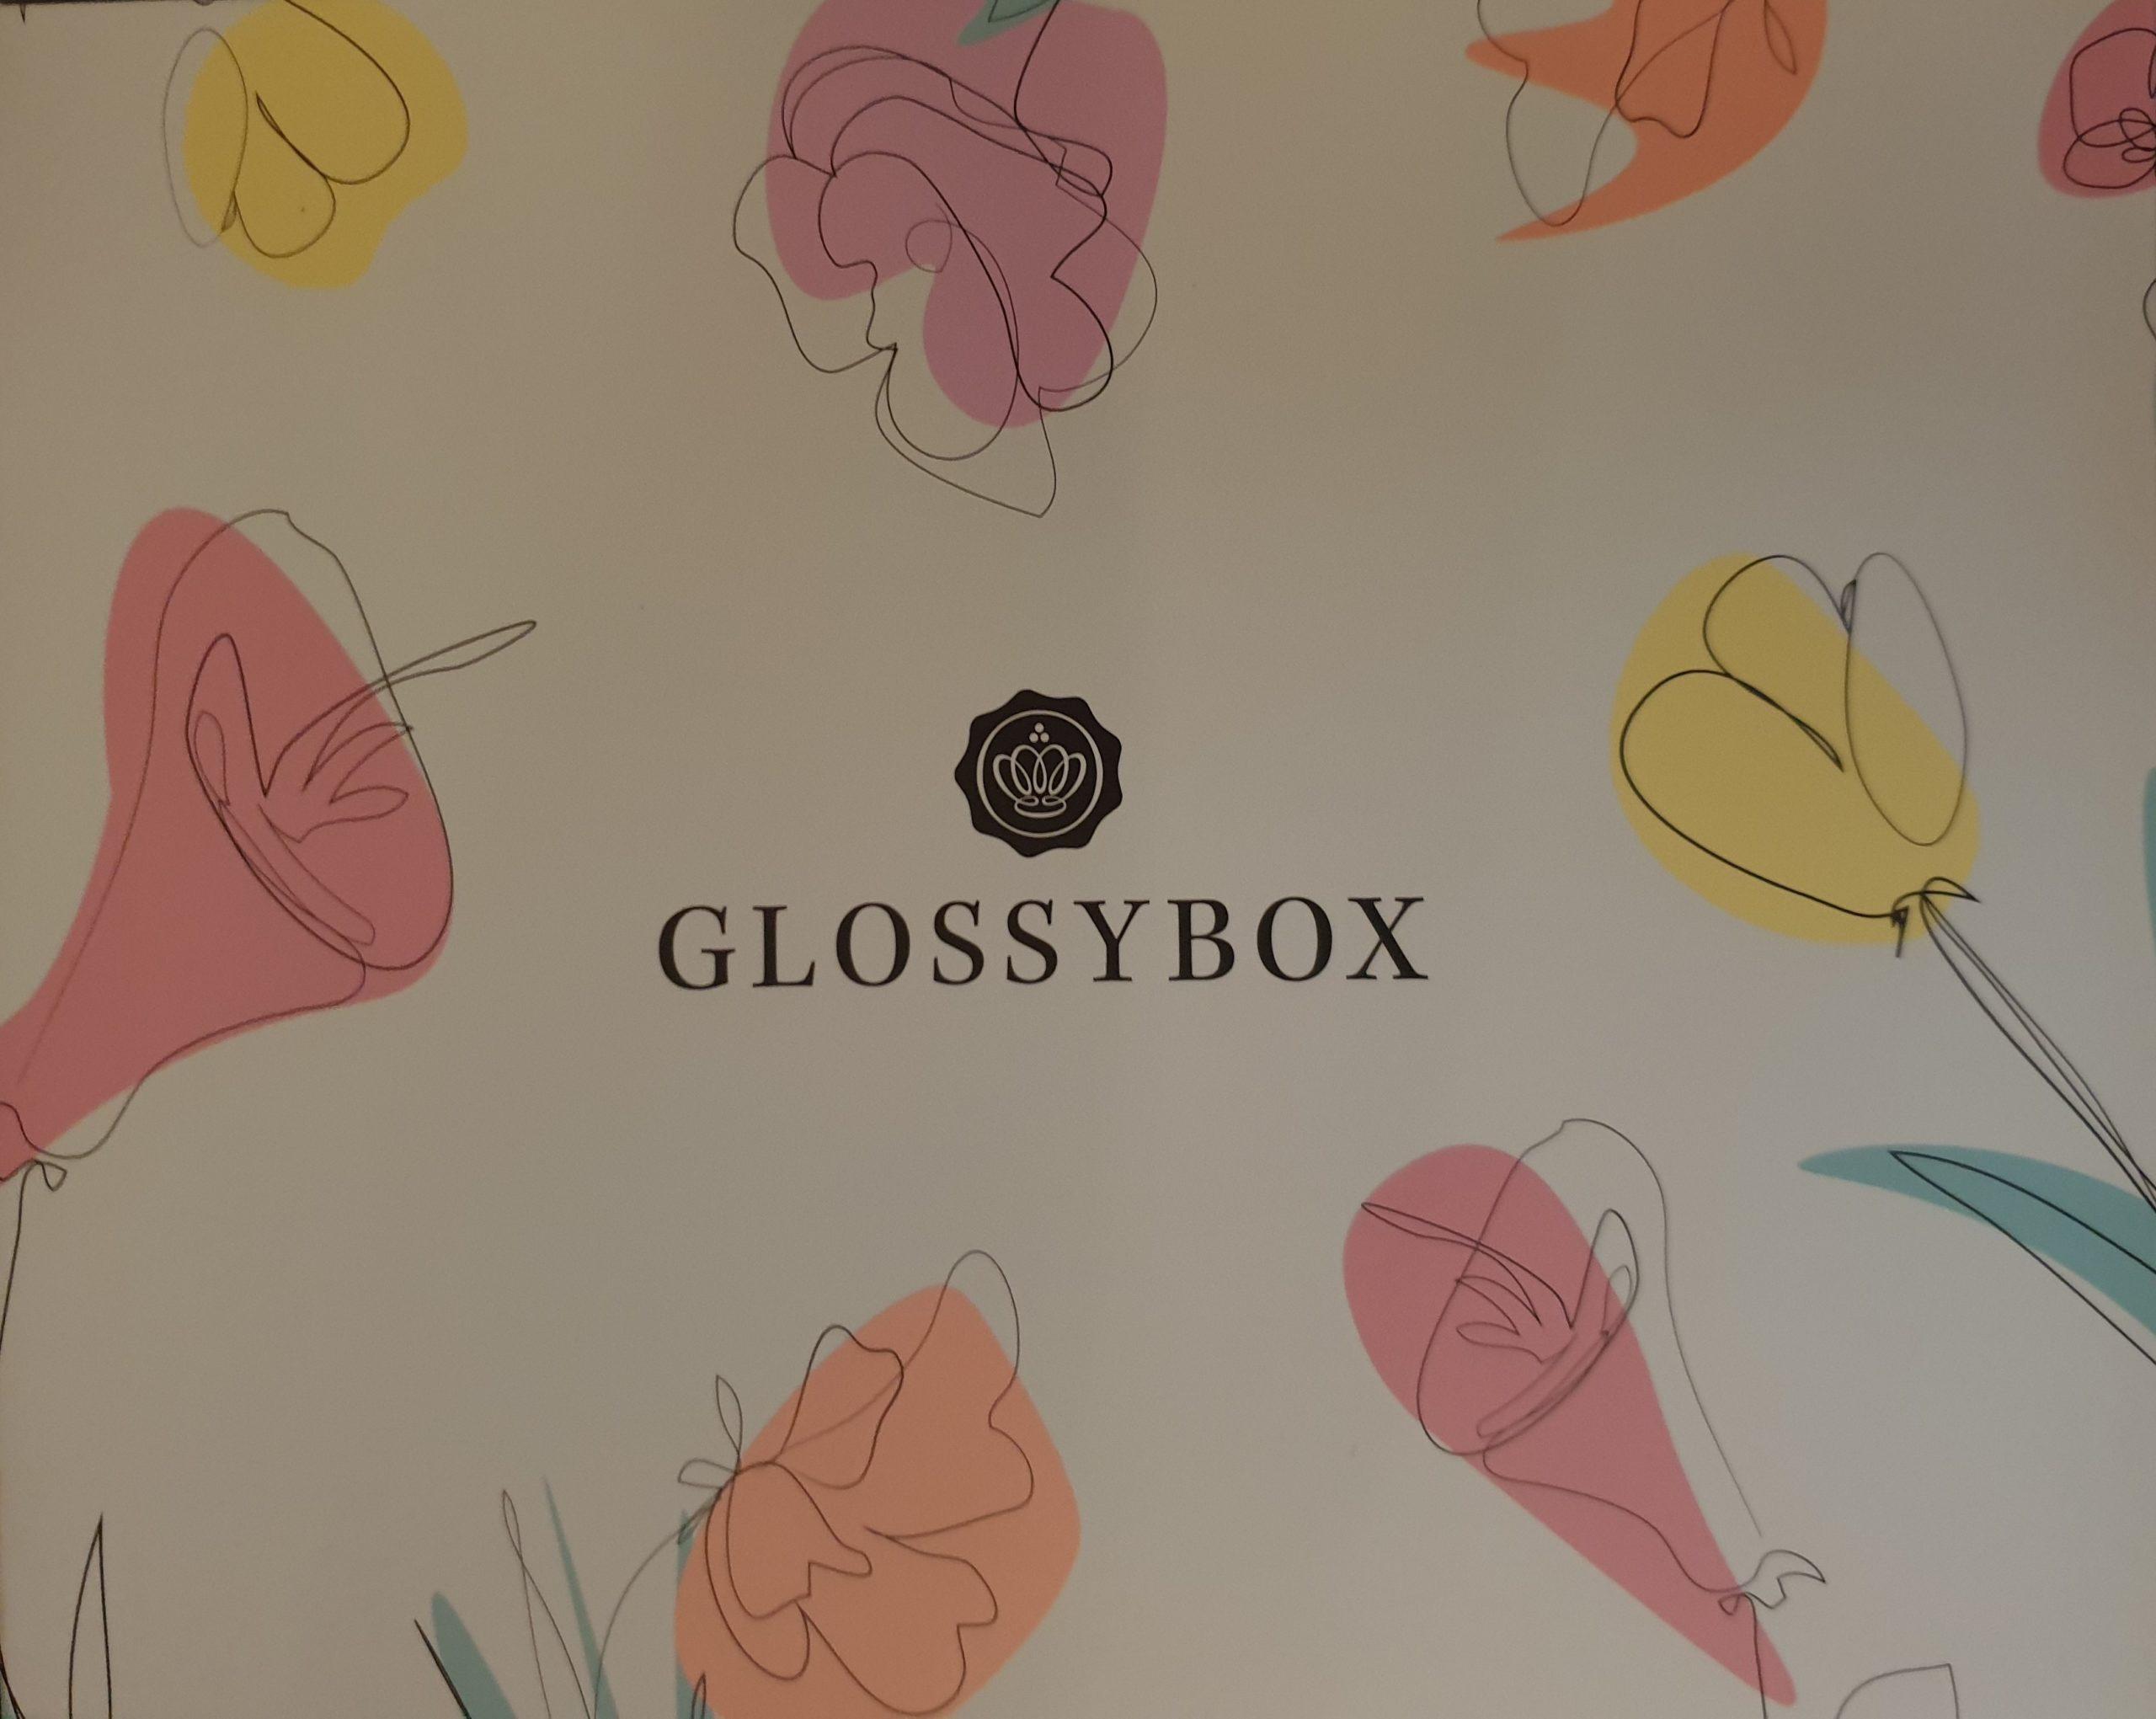 Muttertag Glossybox 2021